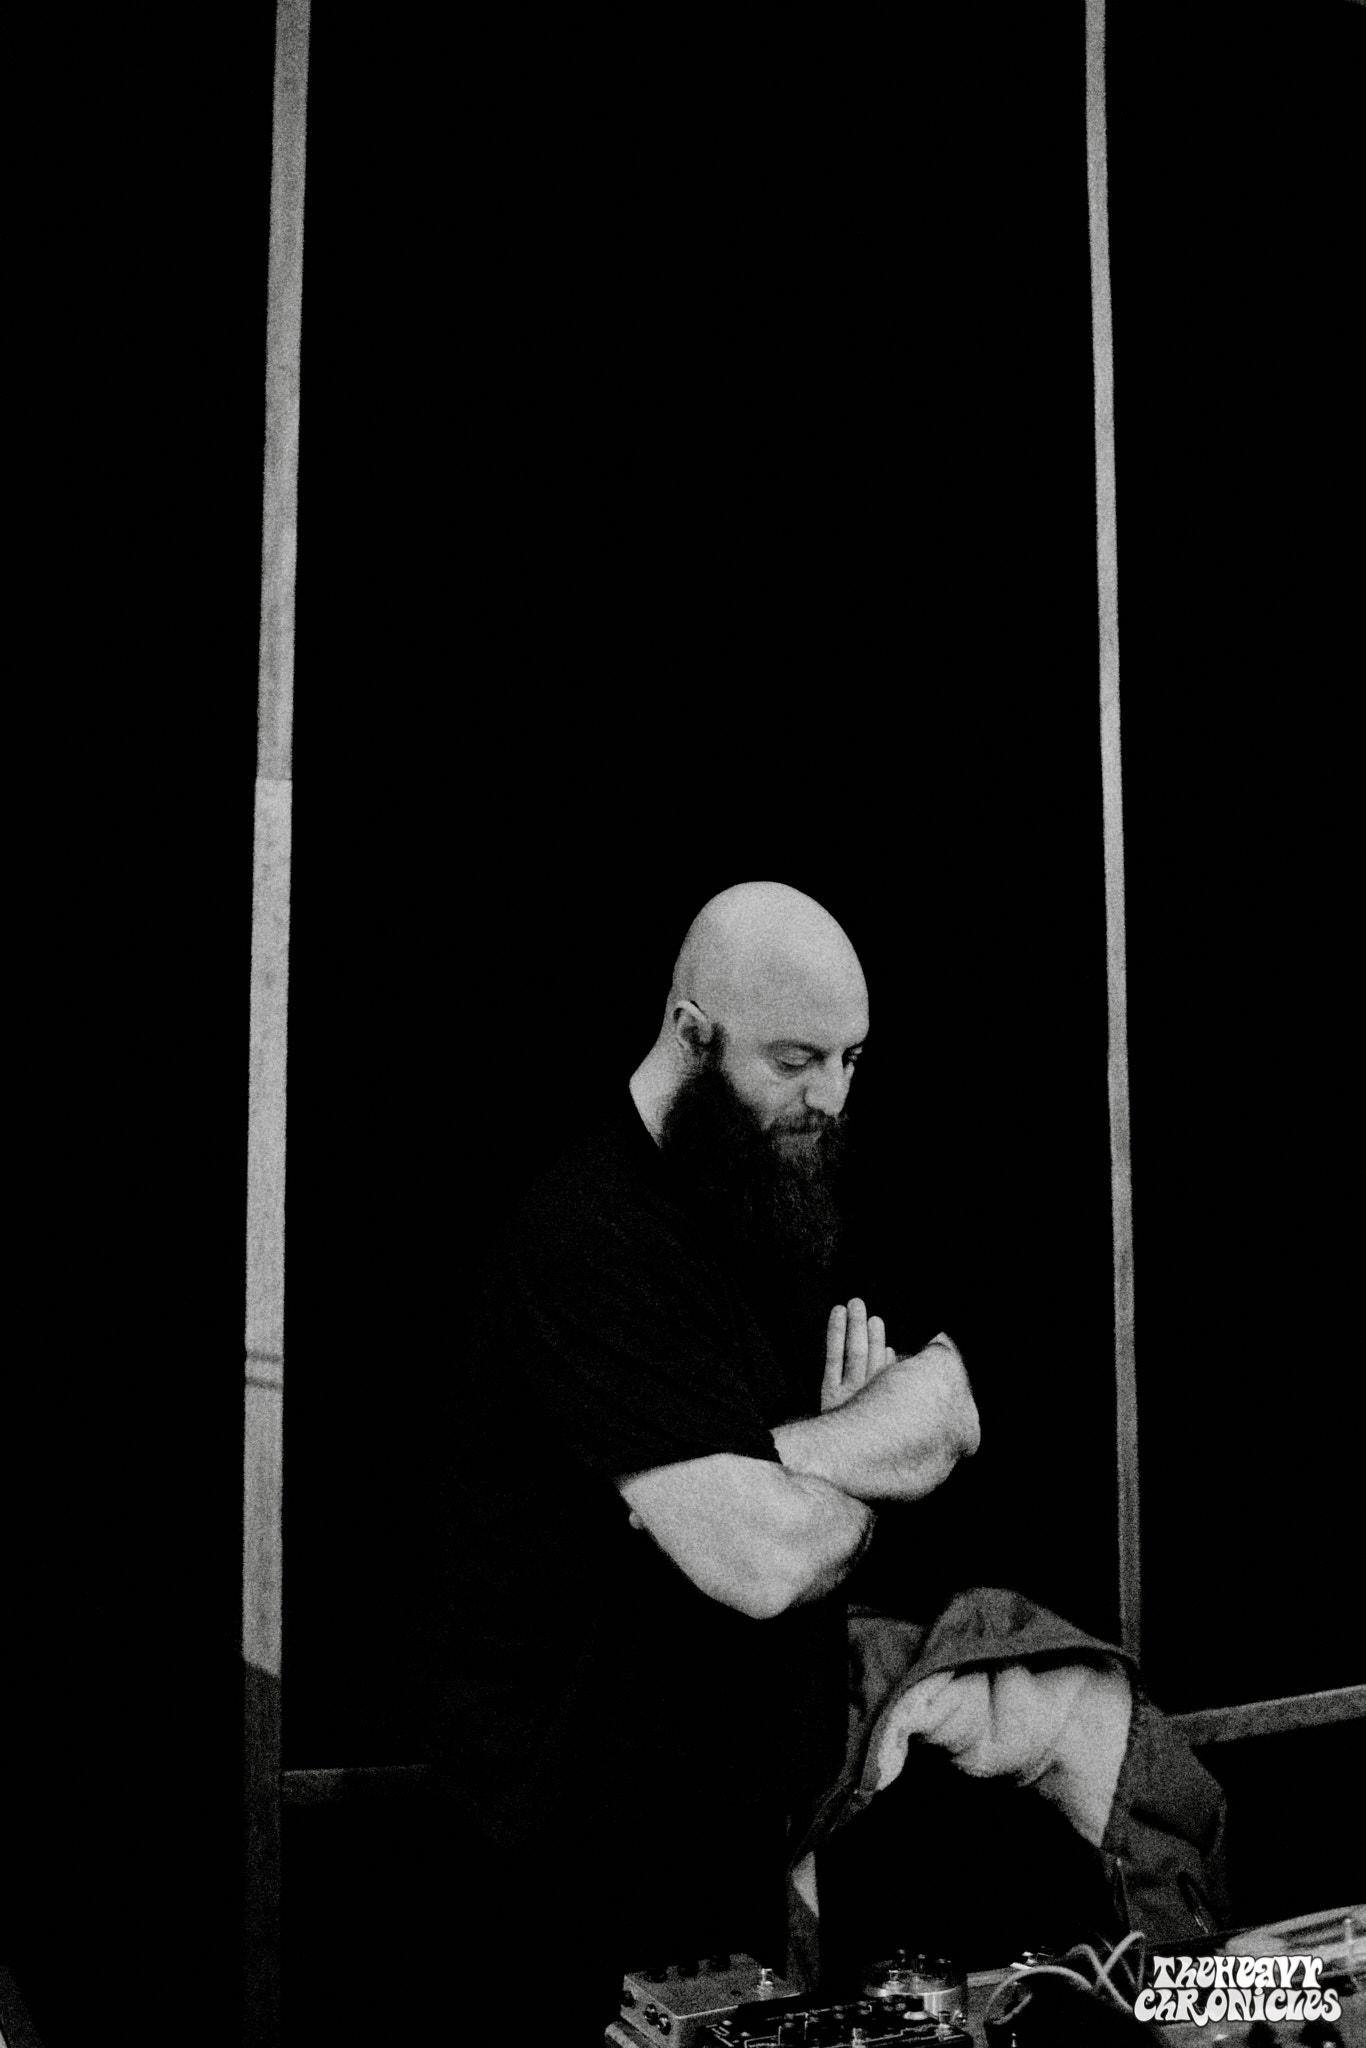 Elder-Studio-Black-Box-2019-Gael-Mathieu-The-Heavy-Chronicles-26